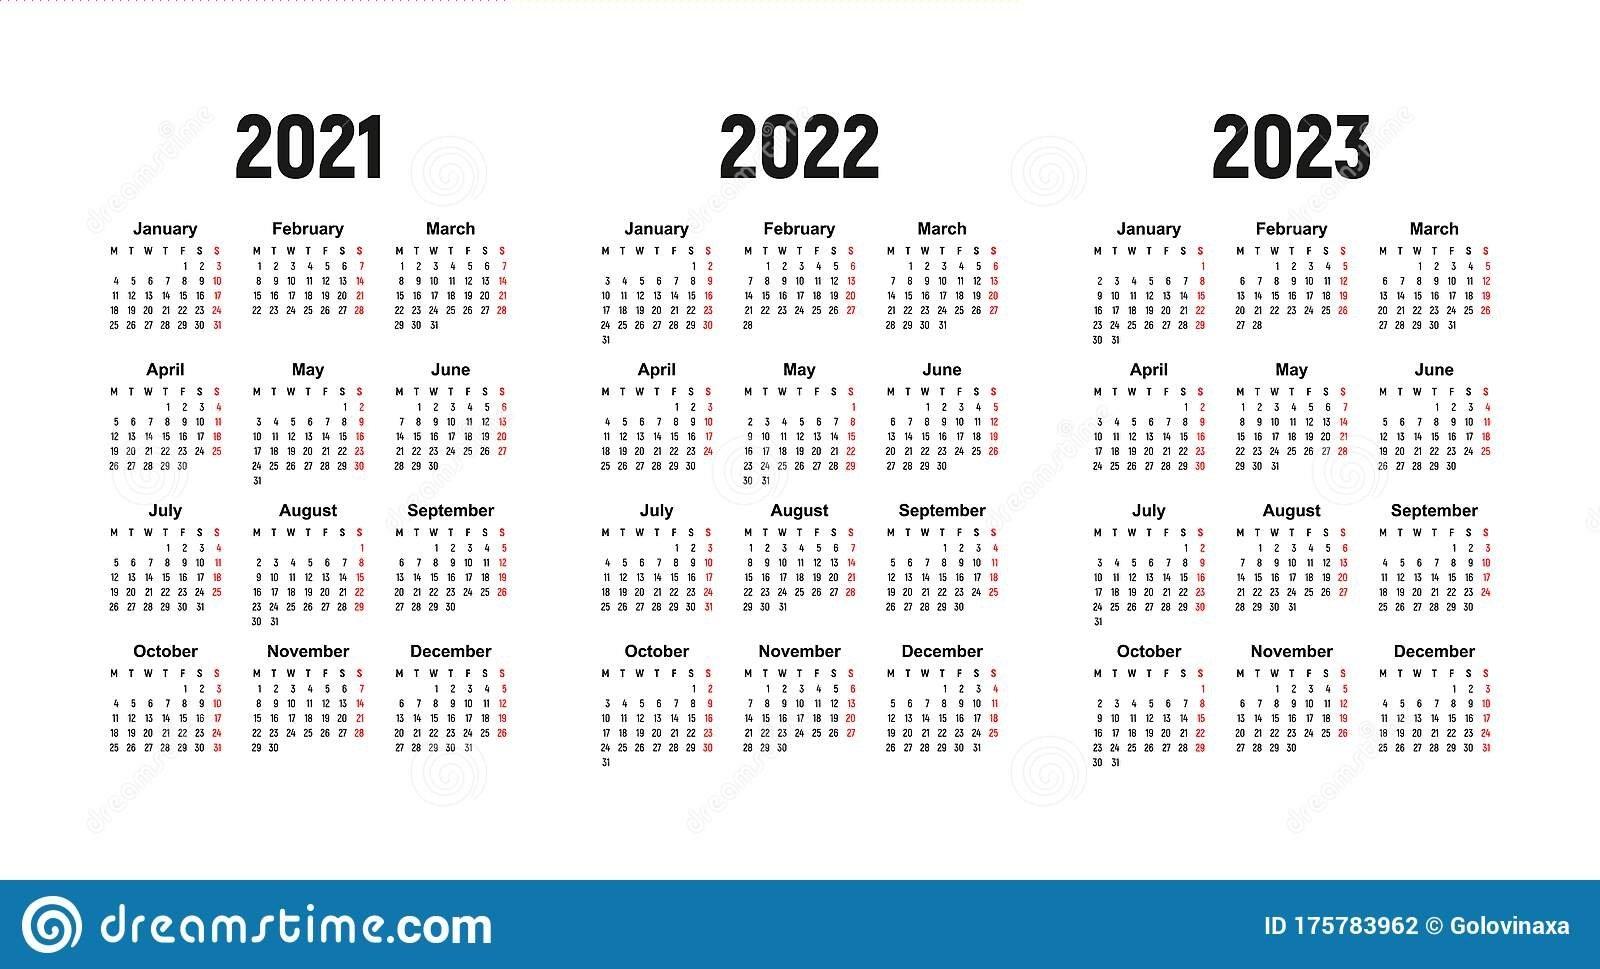 Calendar 2021, 2022 And 2023, Week Starts On Monday, Basic Business Template Stock Vector inside 3 Year Calendar 2021 2021 2022 Graphics